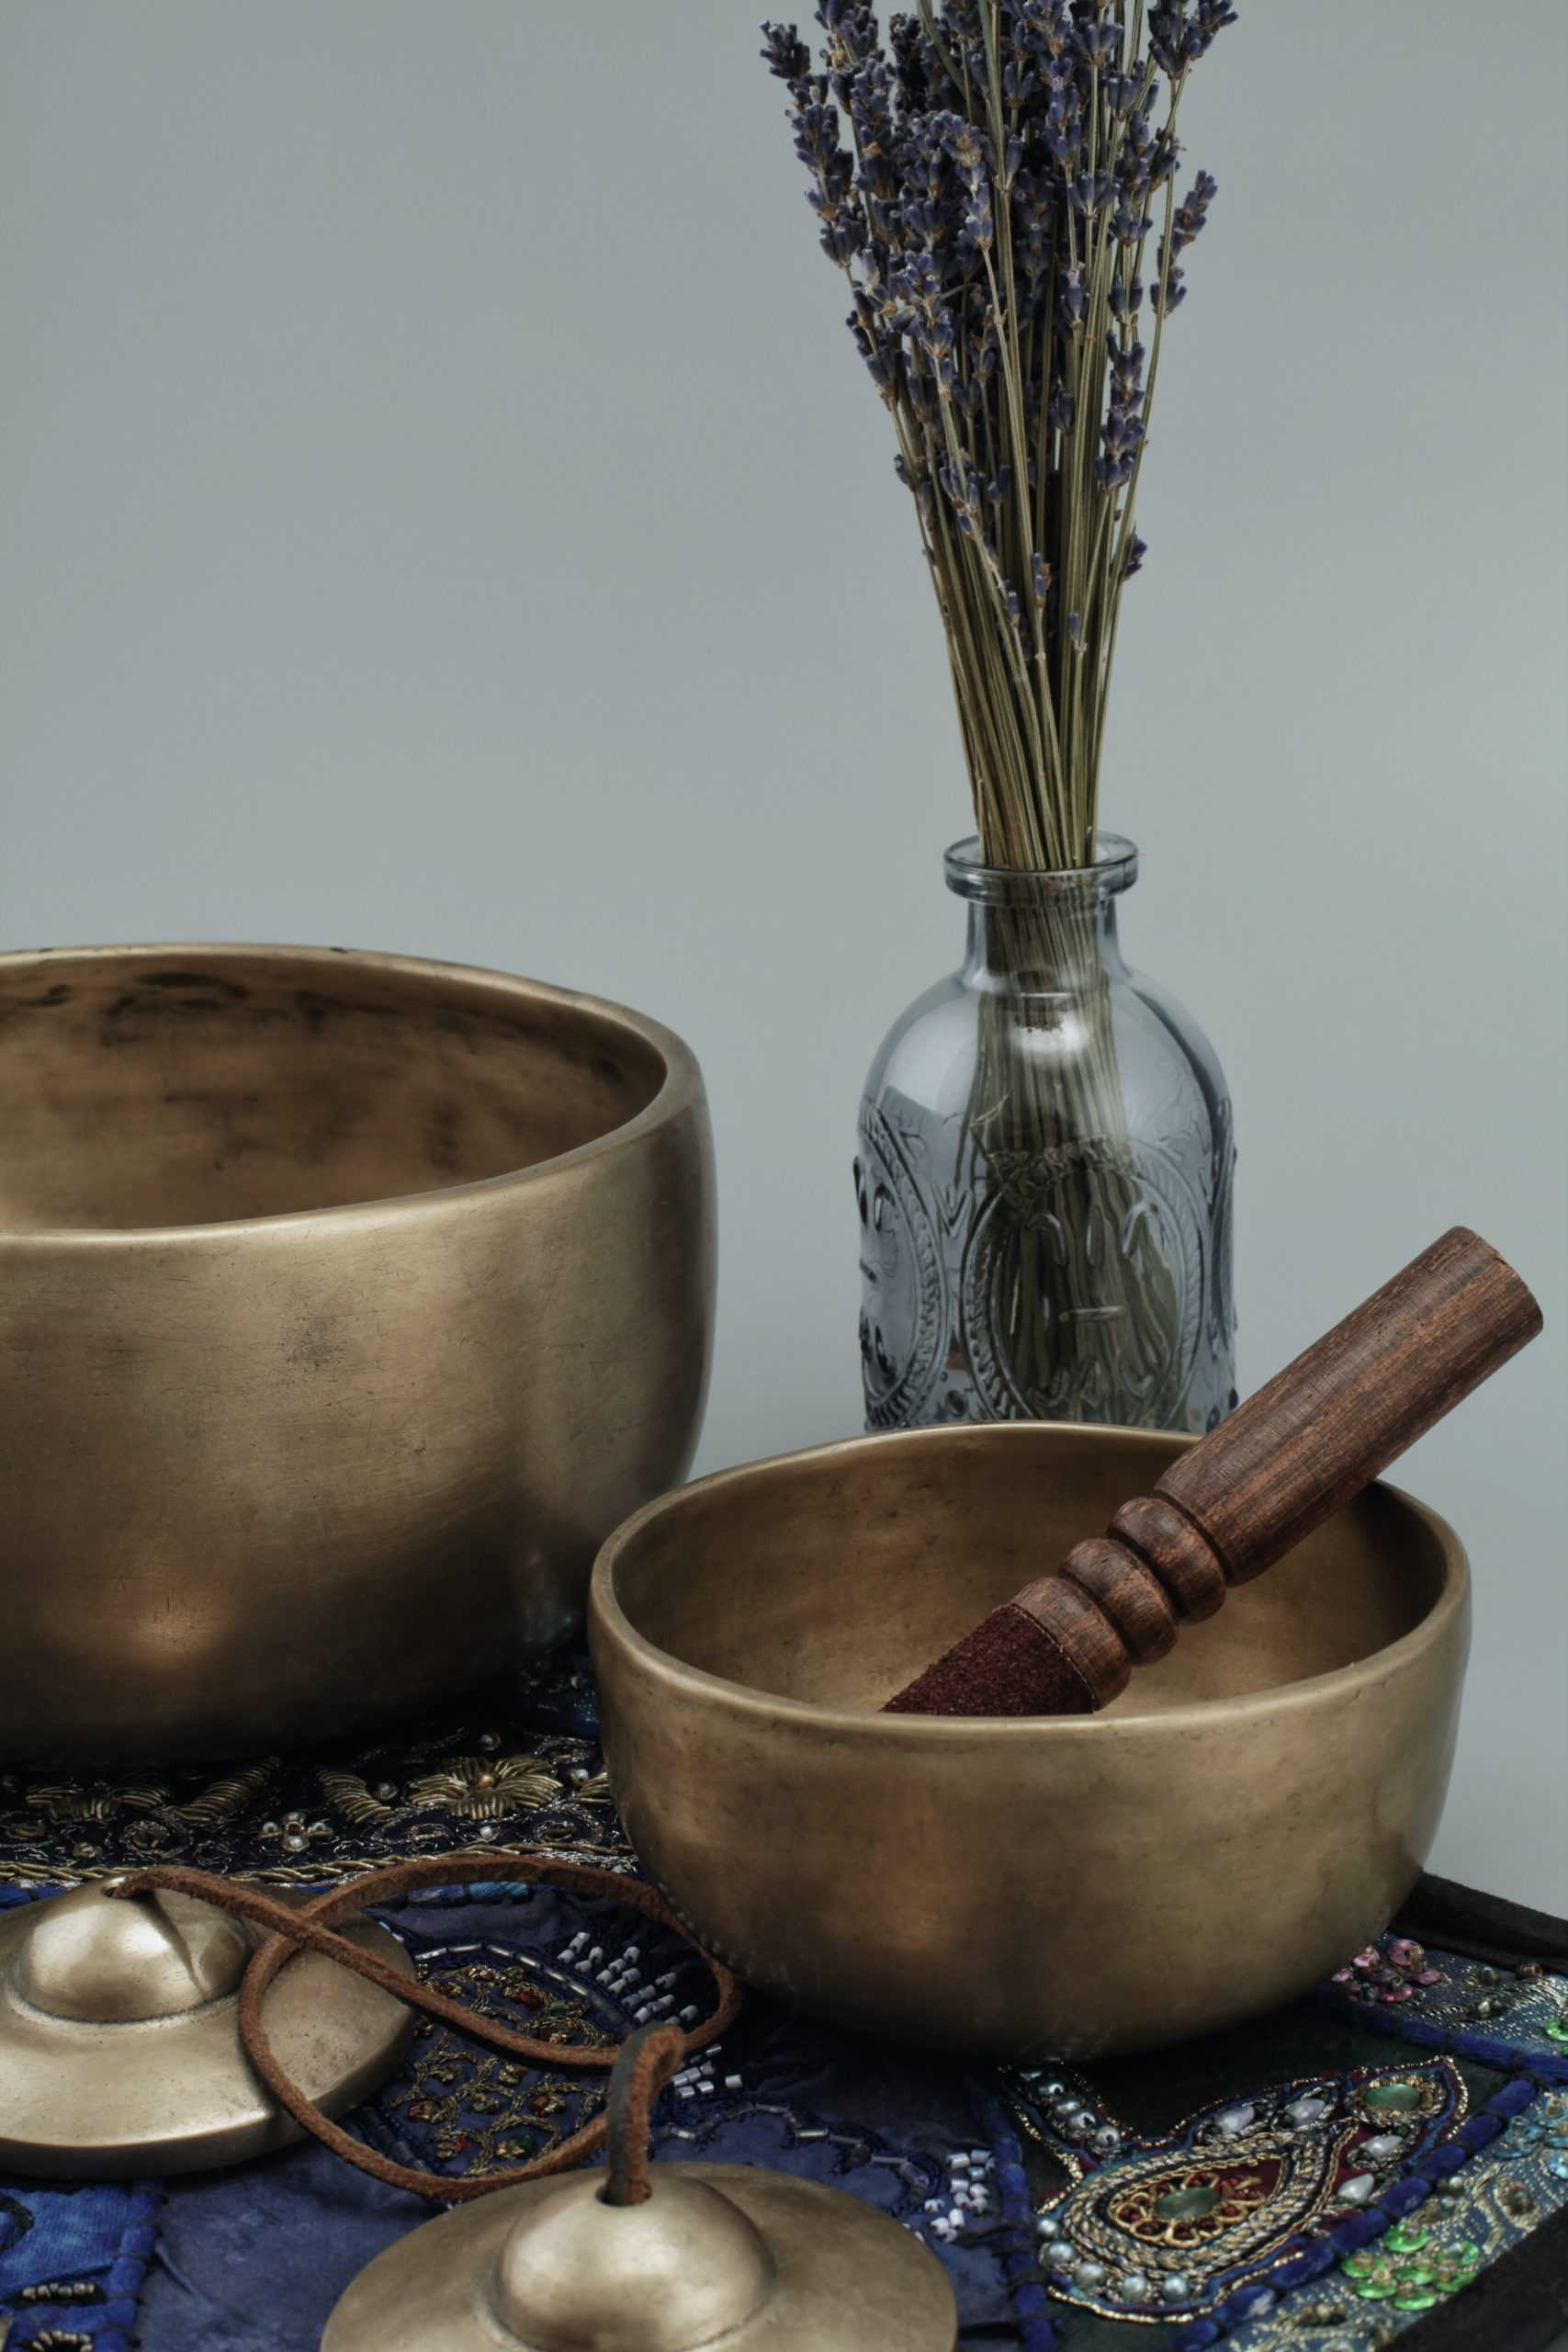 klankschaal-ceremonie-klankbad-mali-retreat-magic-bowls-b08FP4cLpFw-unsplash